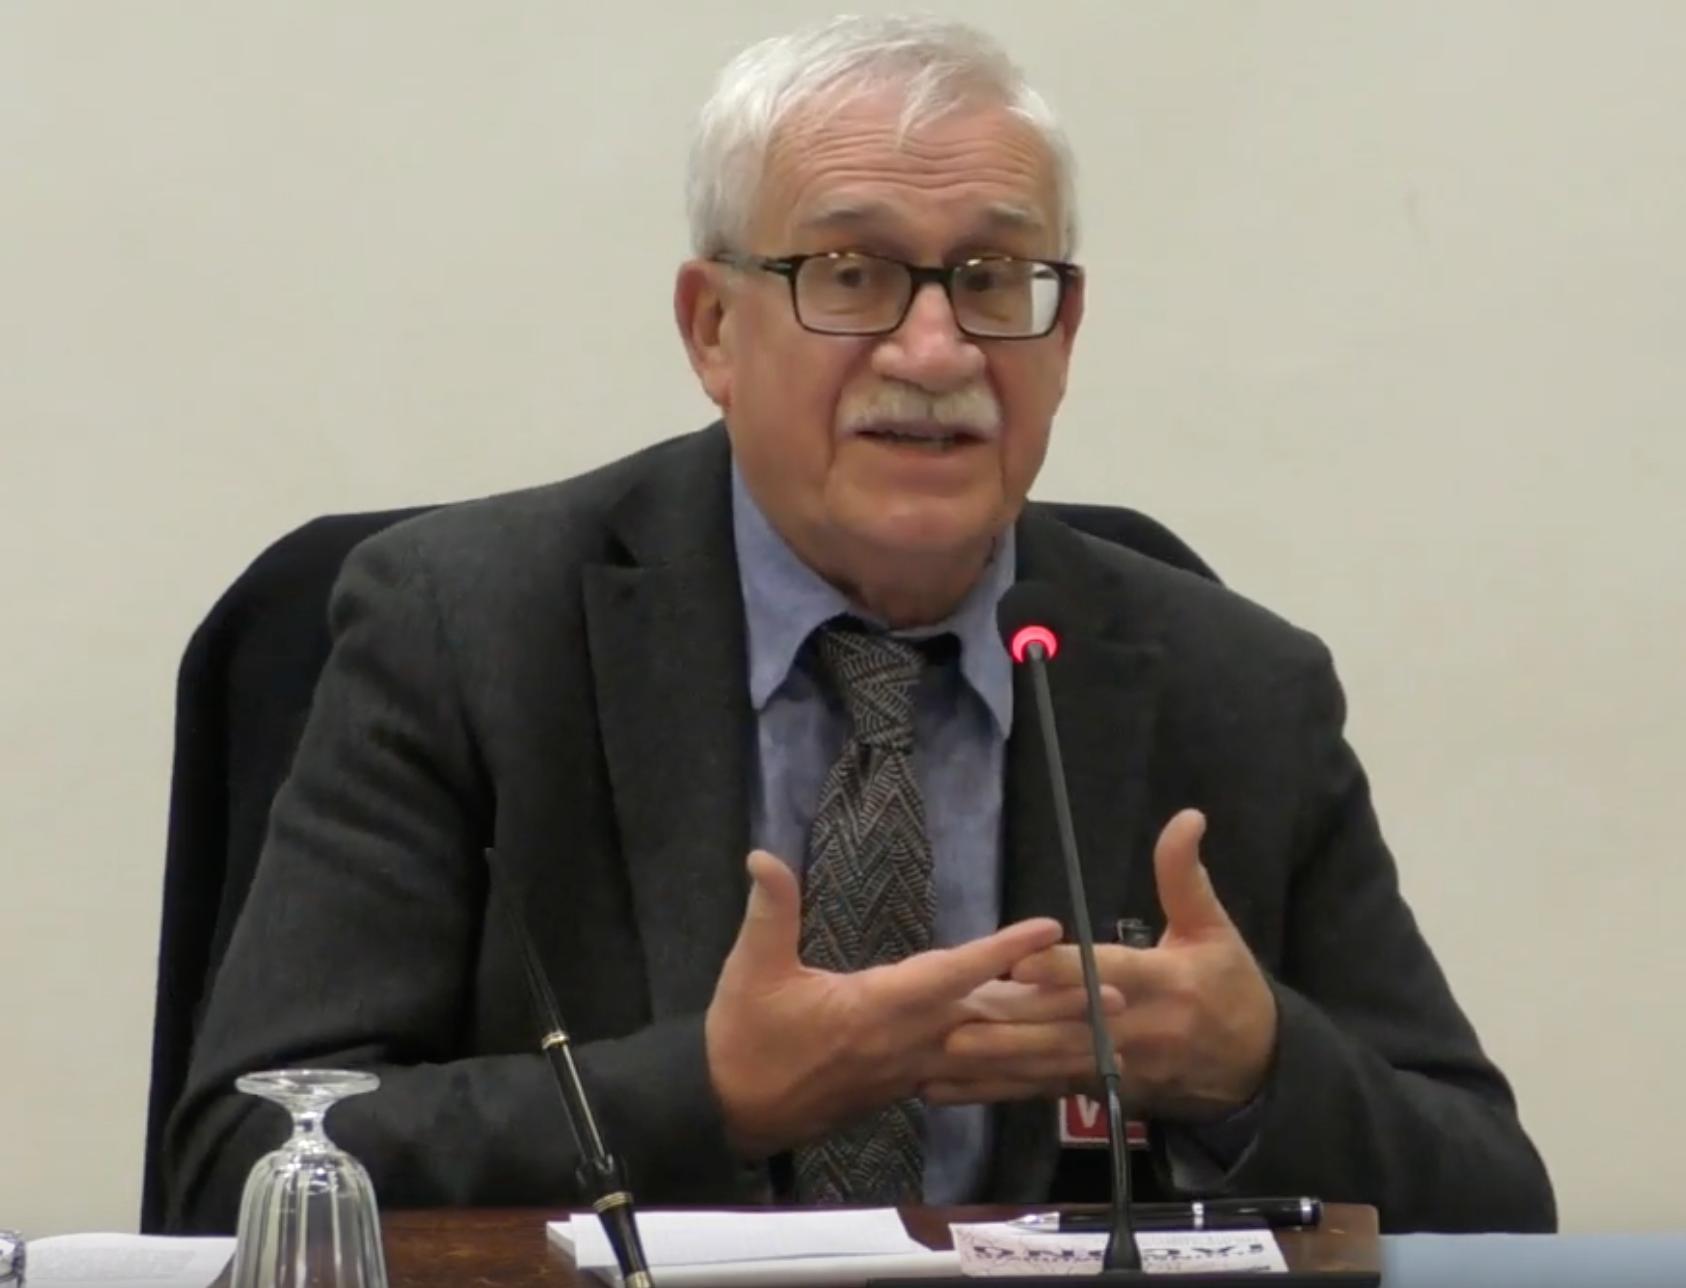 Alfonso Maurizio Iacono